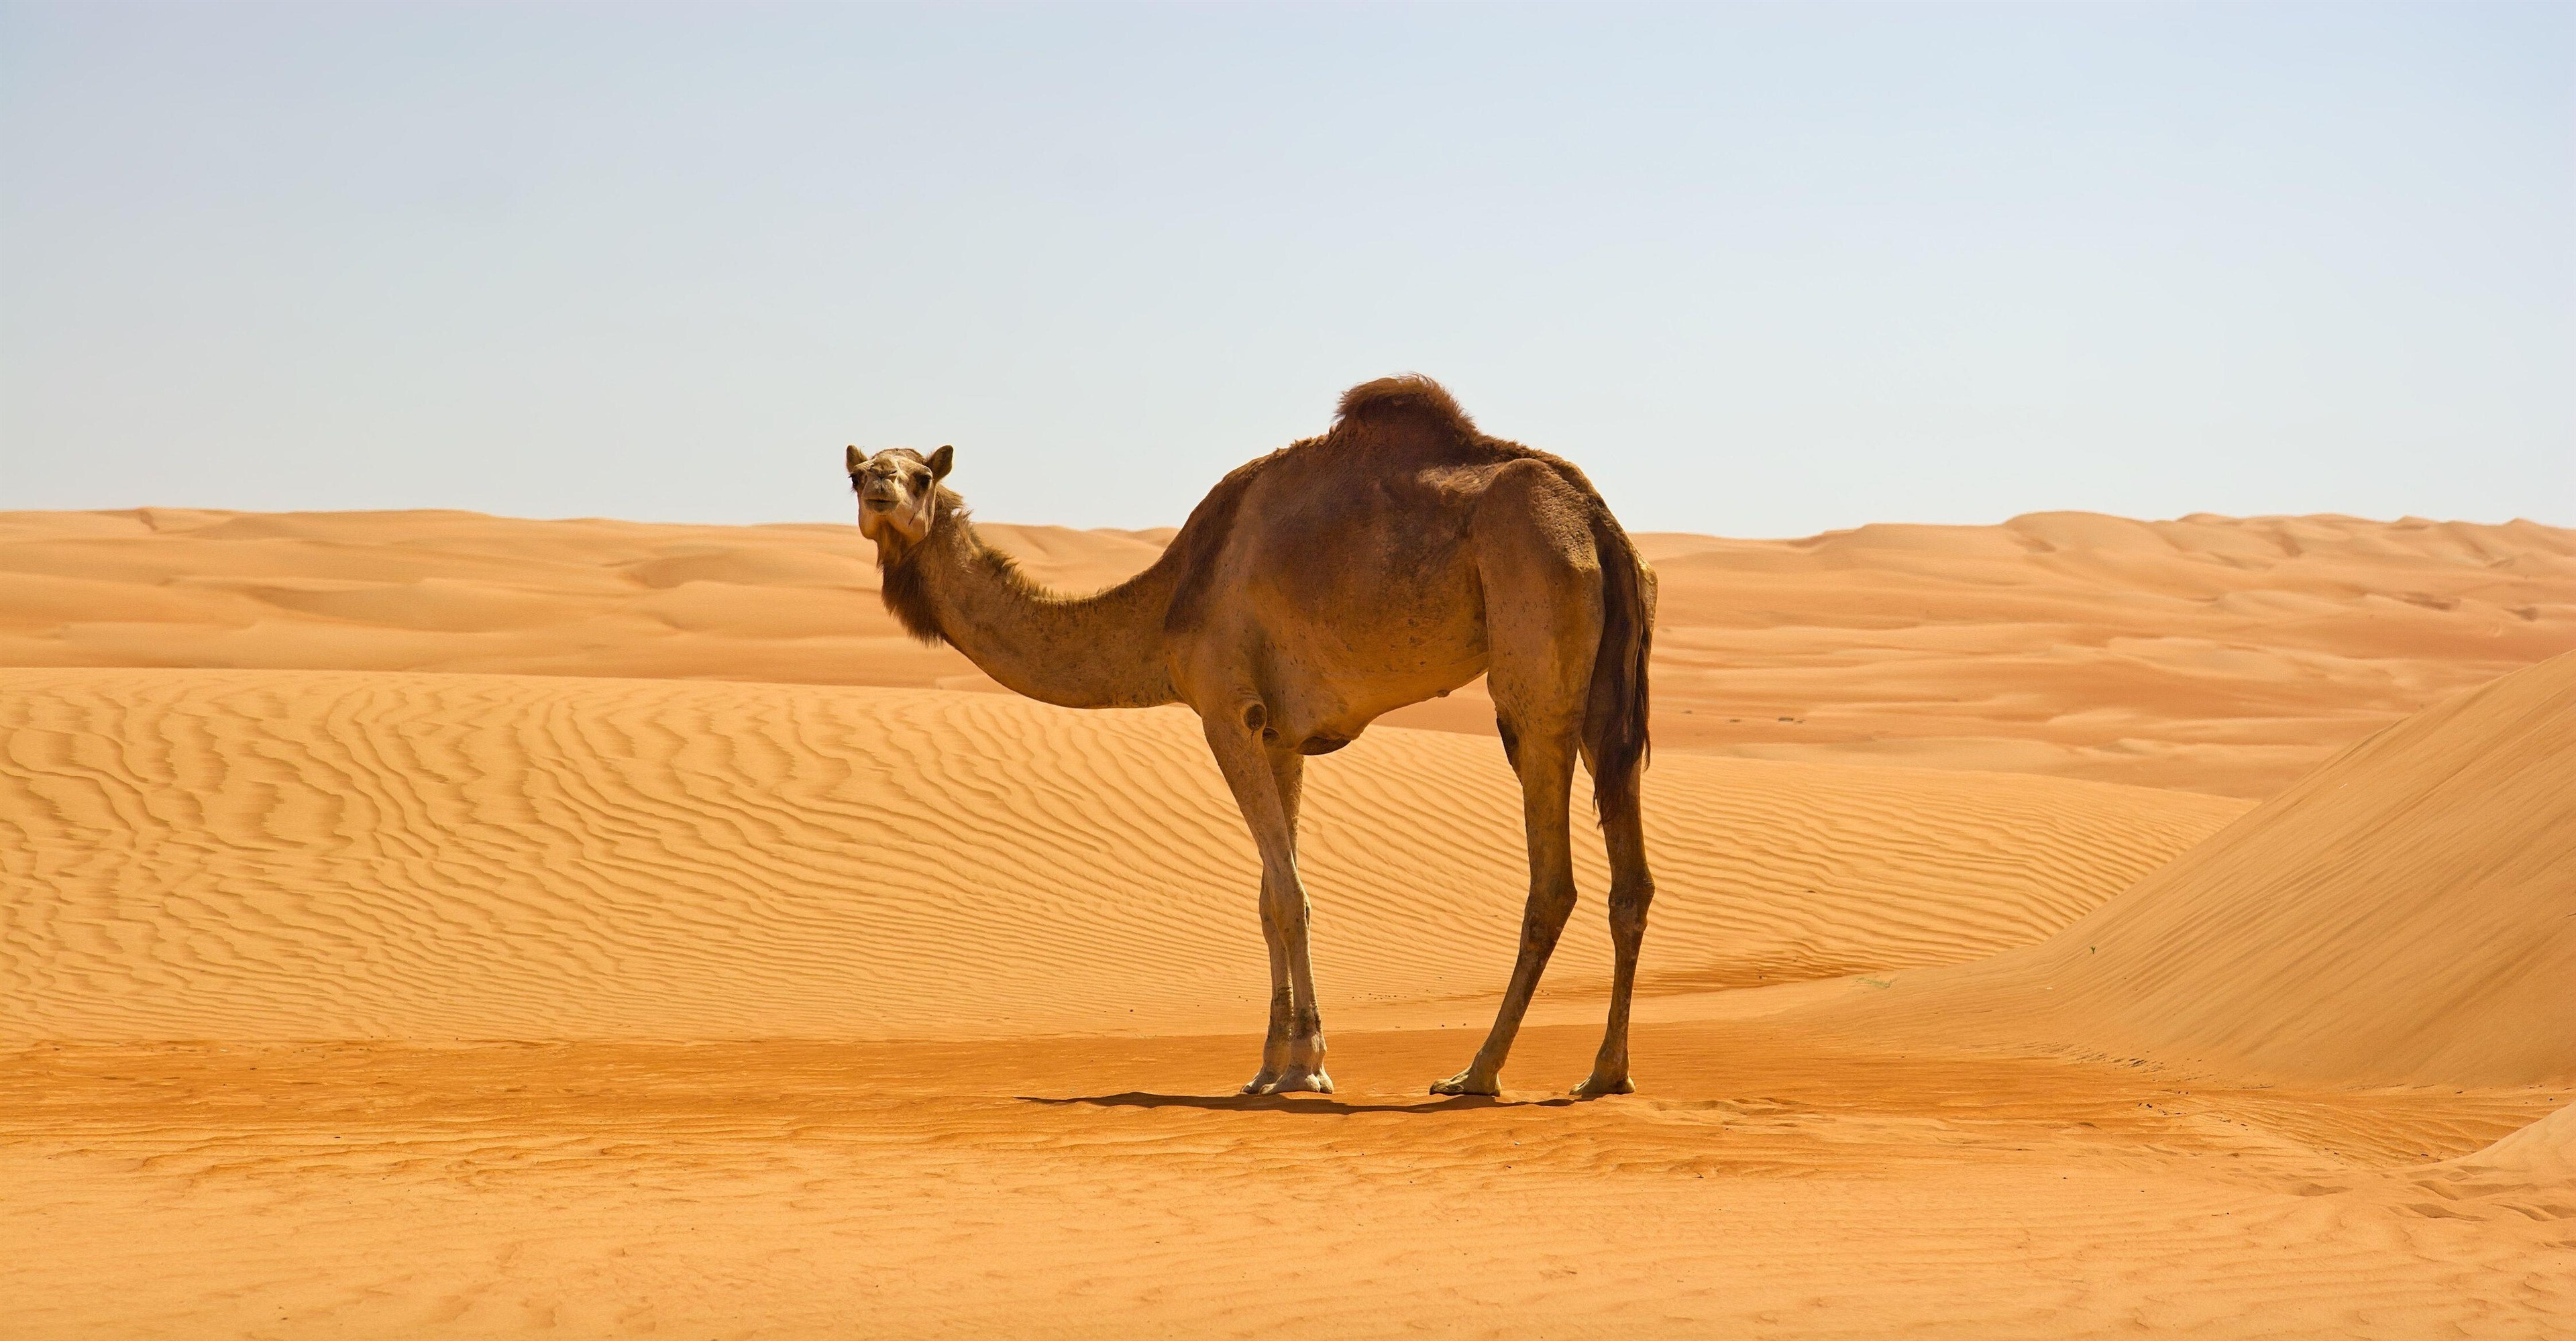 Camel In Namib Desert 4k Wallpaper Hd Wallpapers